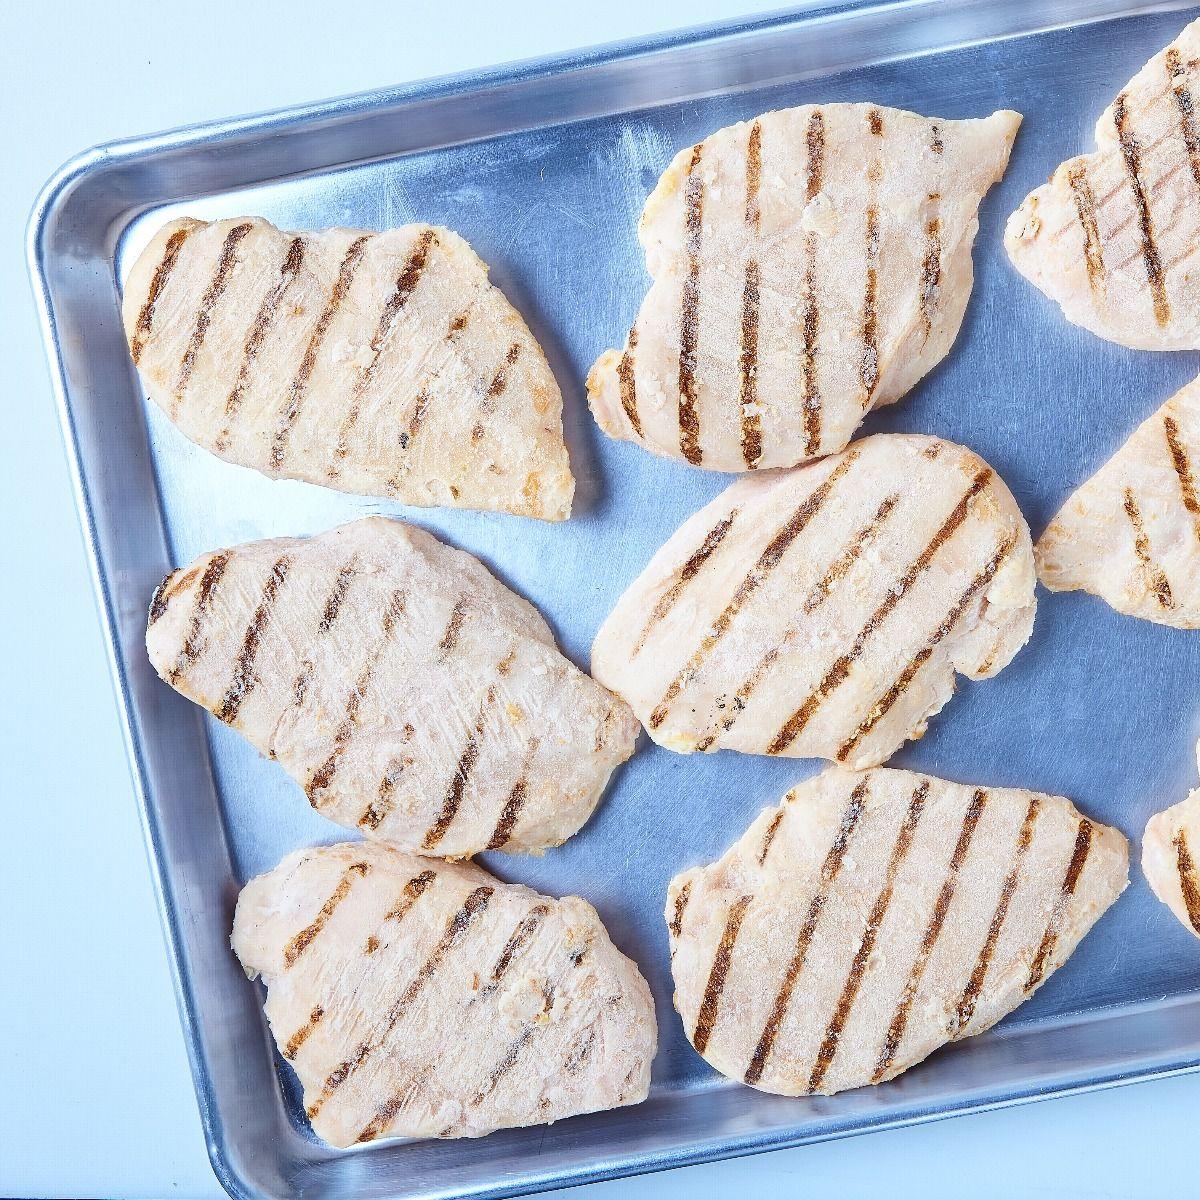 Boneless chicken breasts, fully cooked (seasoned)